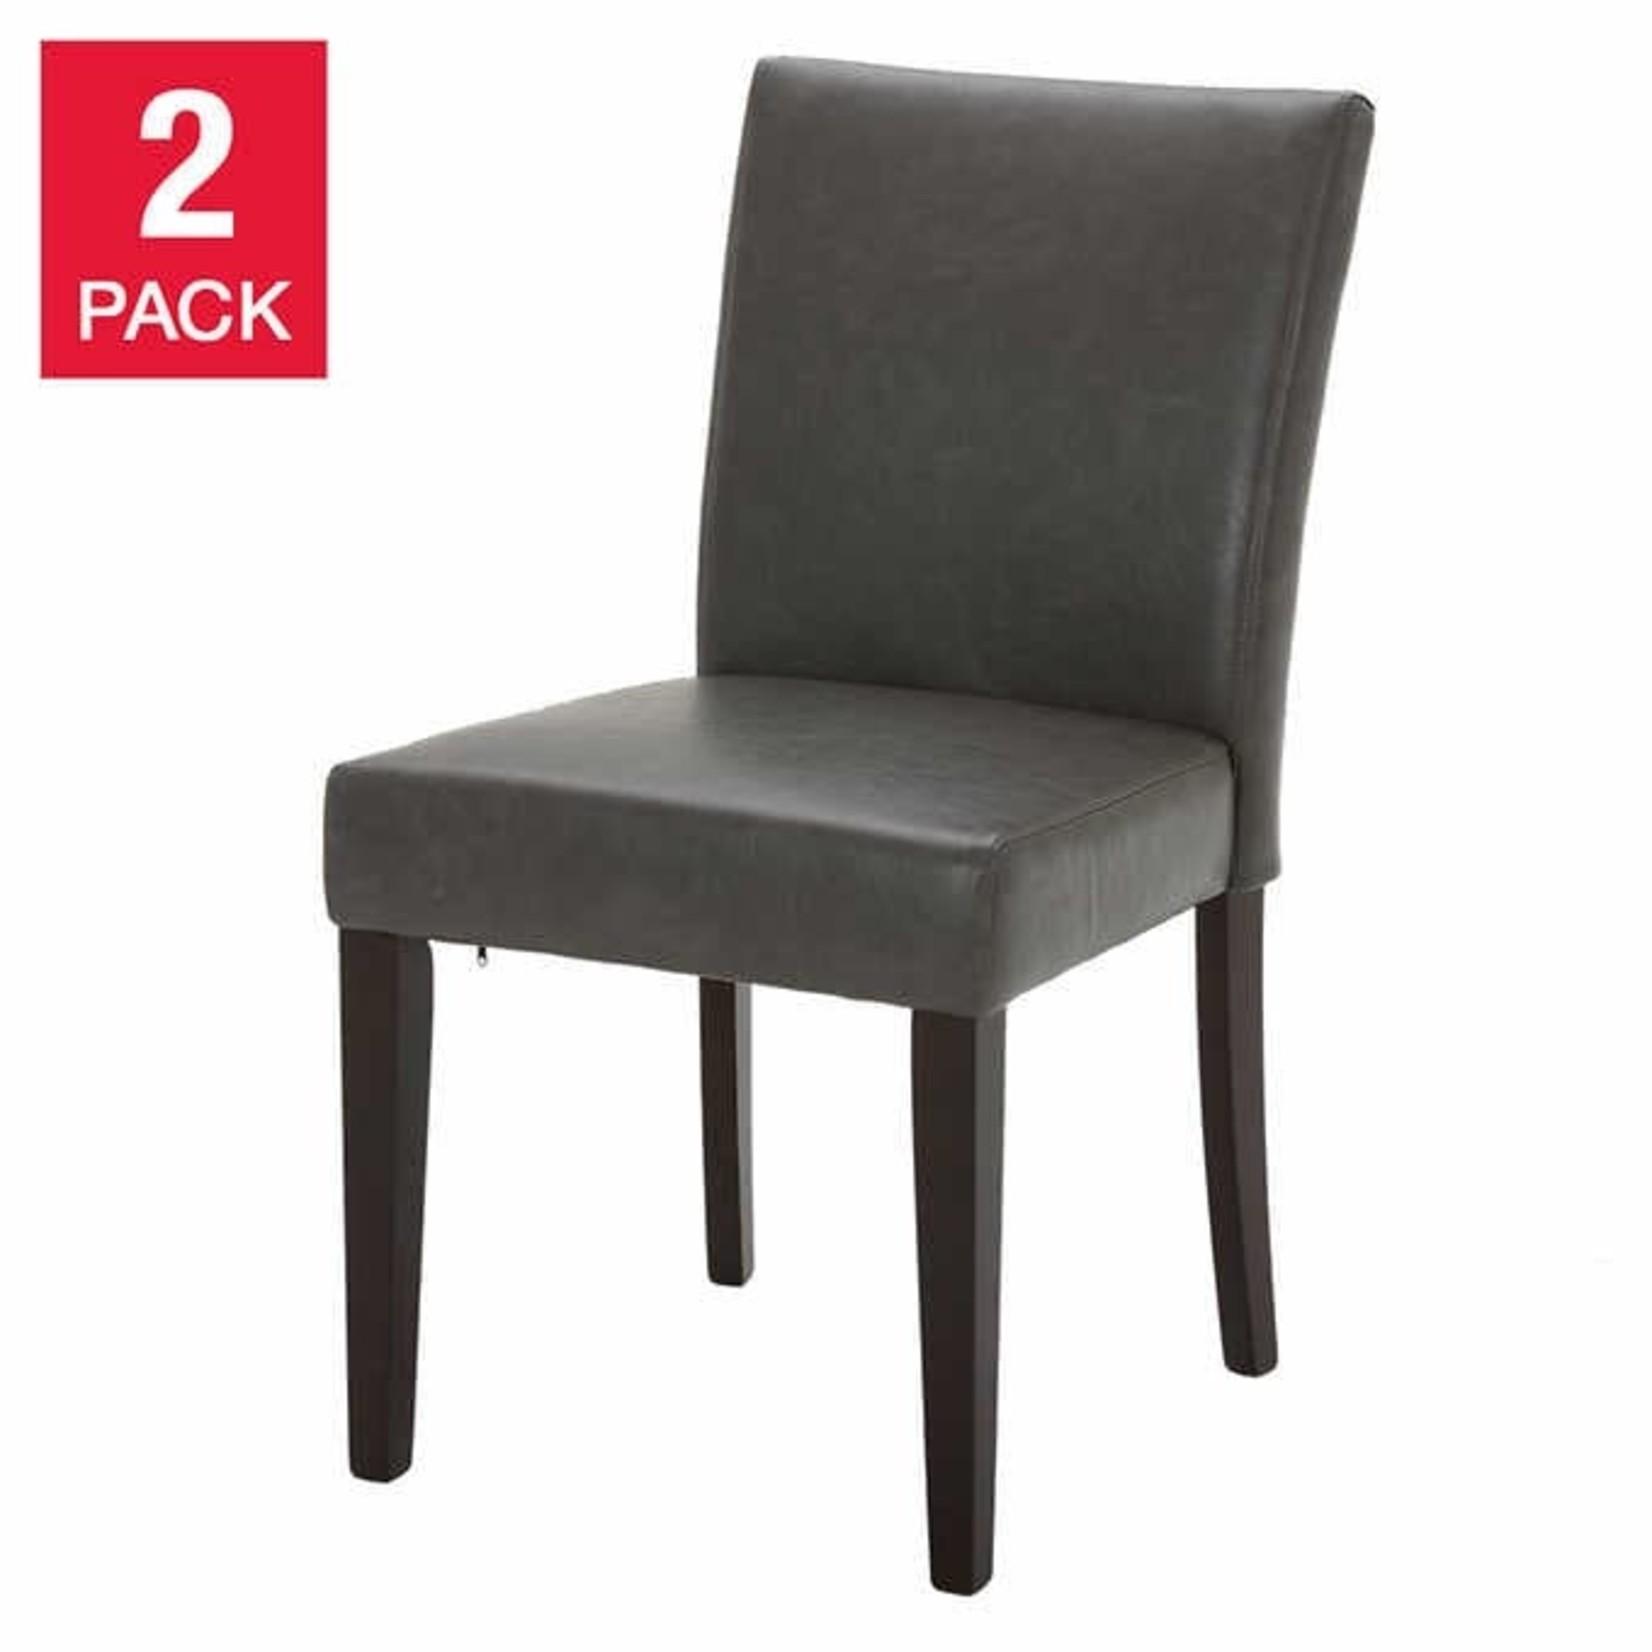 Emmett Grey Chair 2-pack